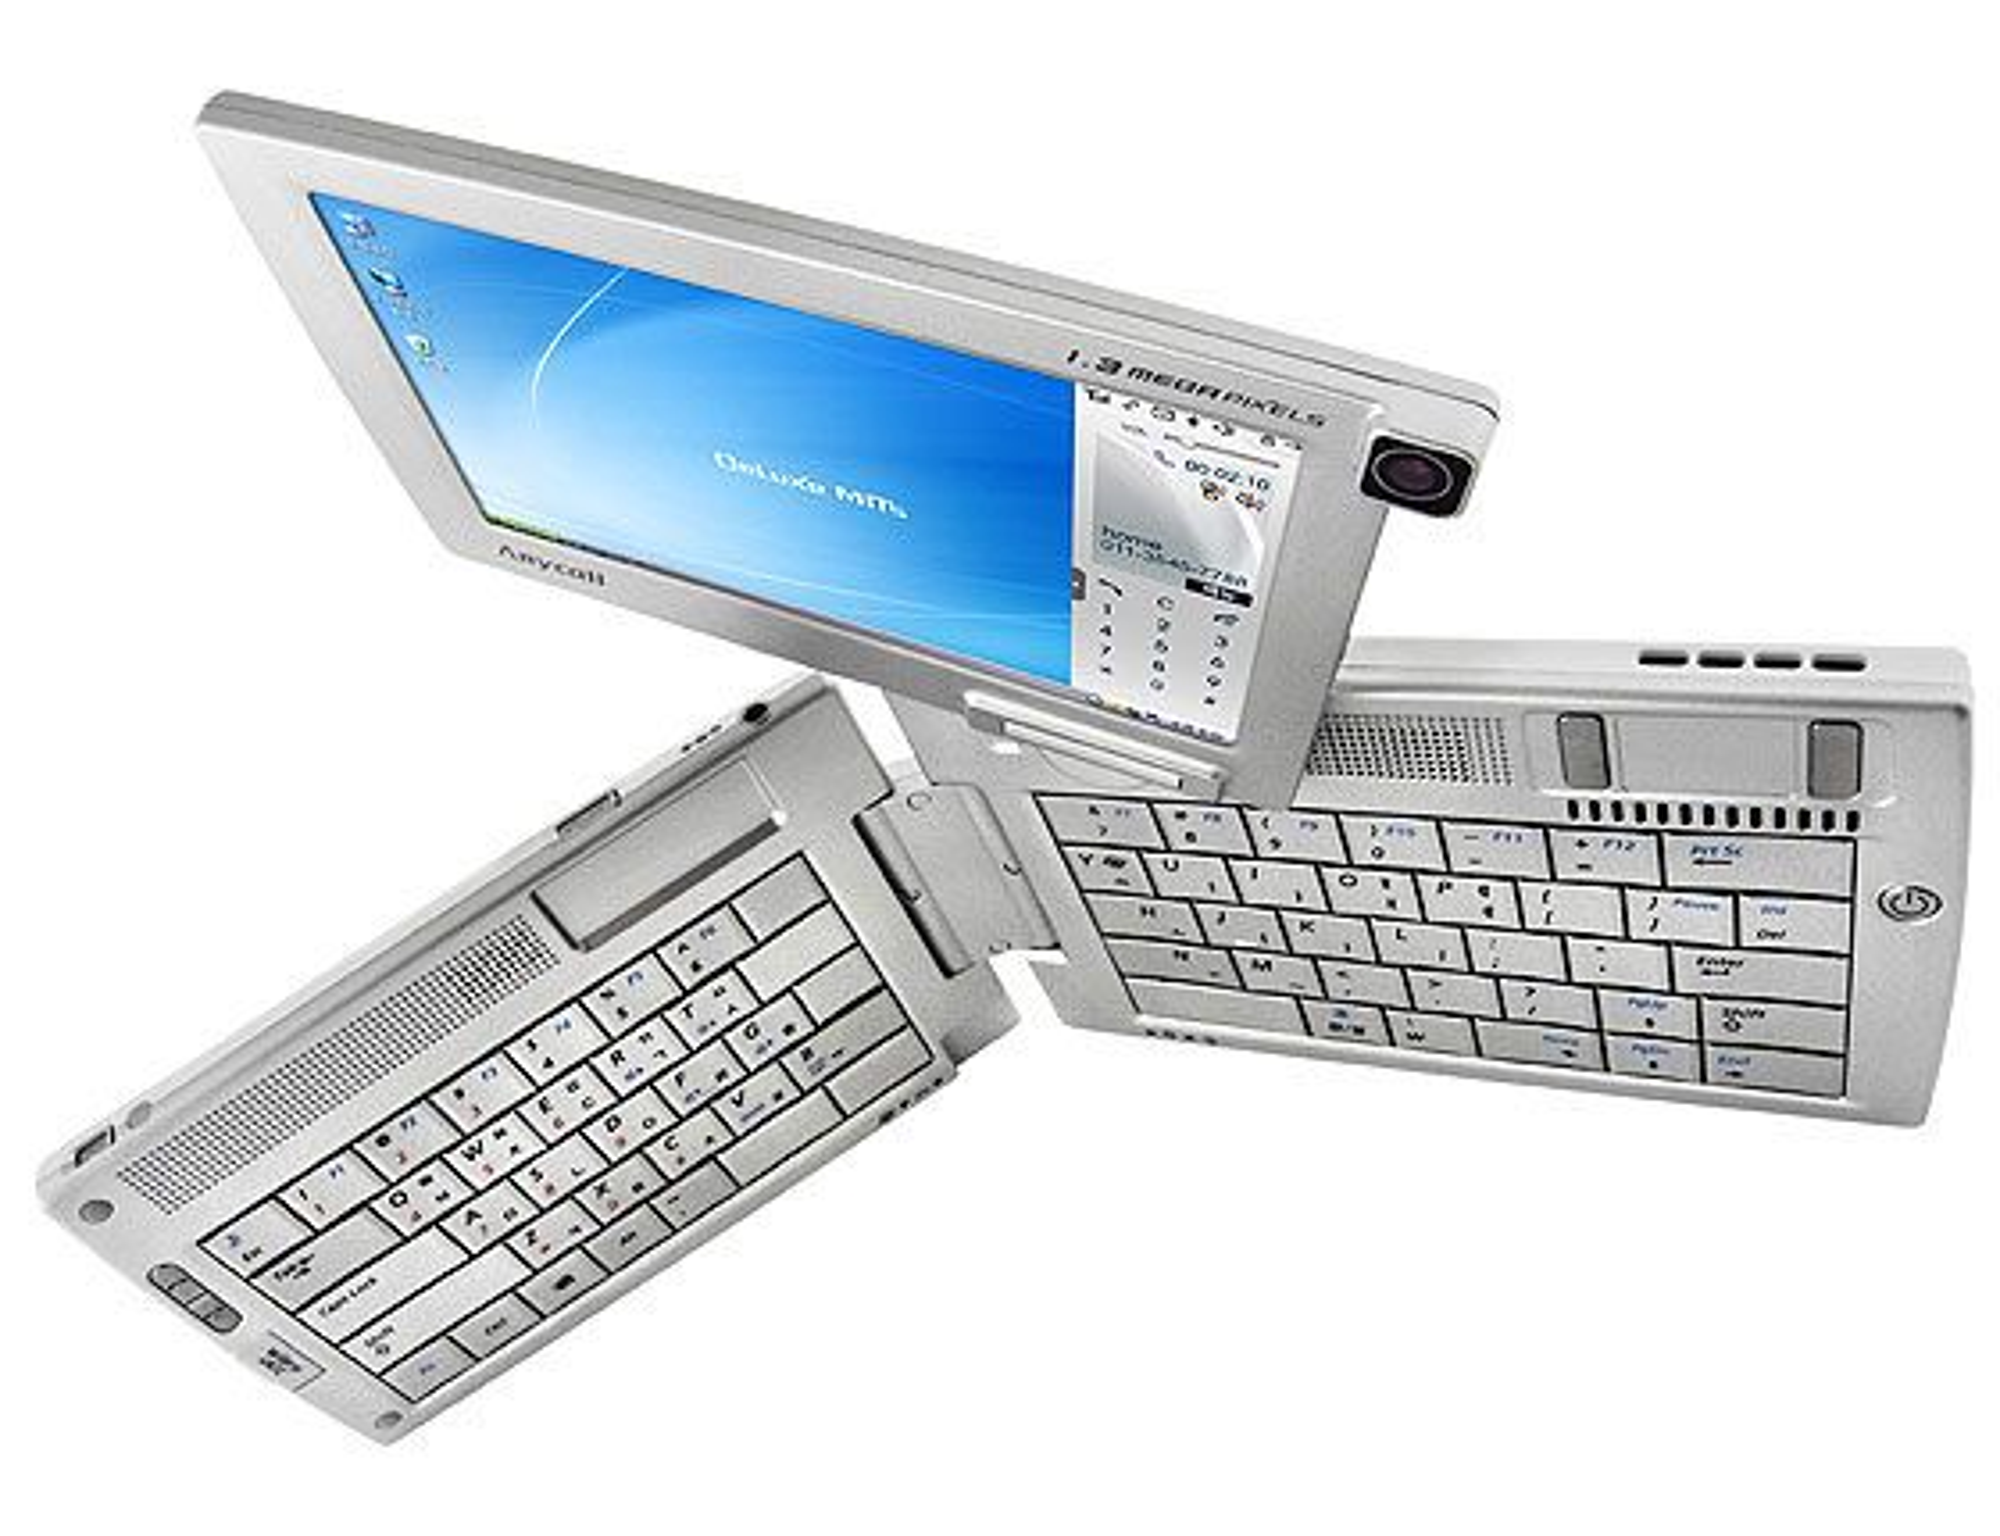 Samsung P9000